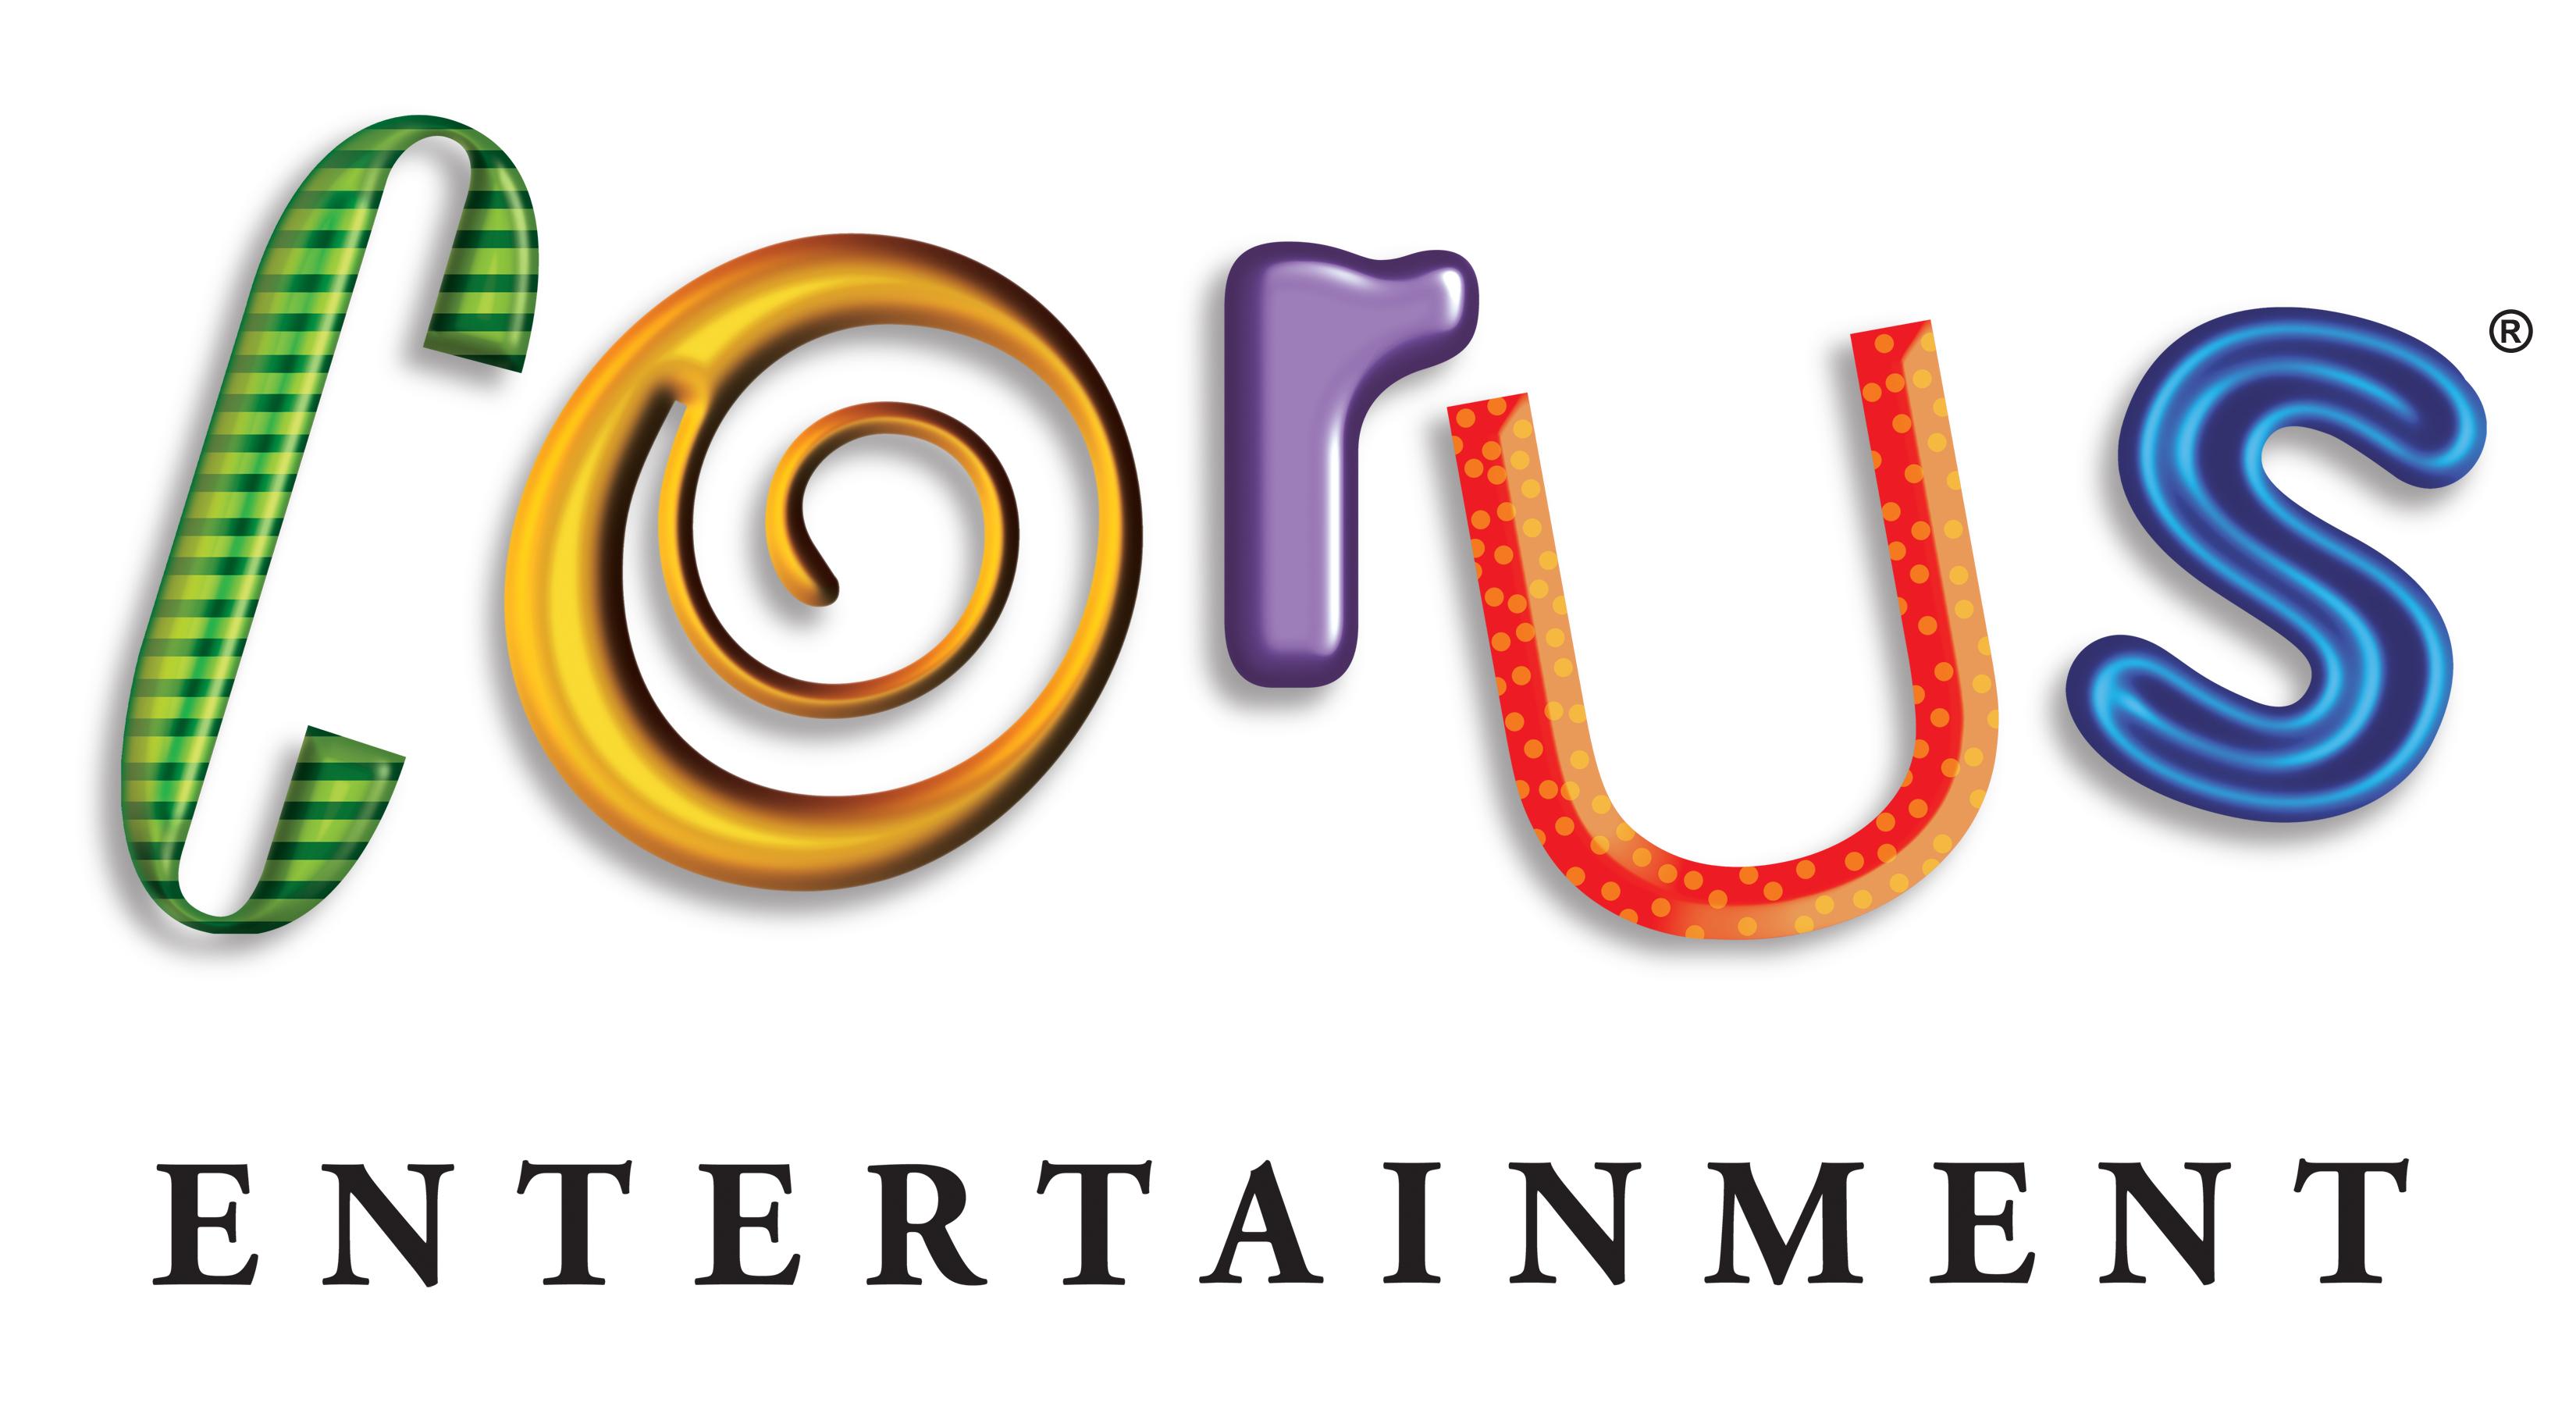 corusl_logo